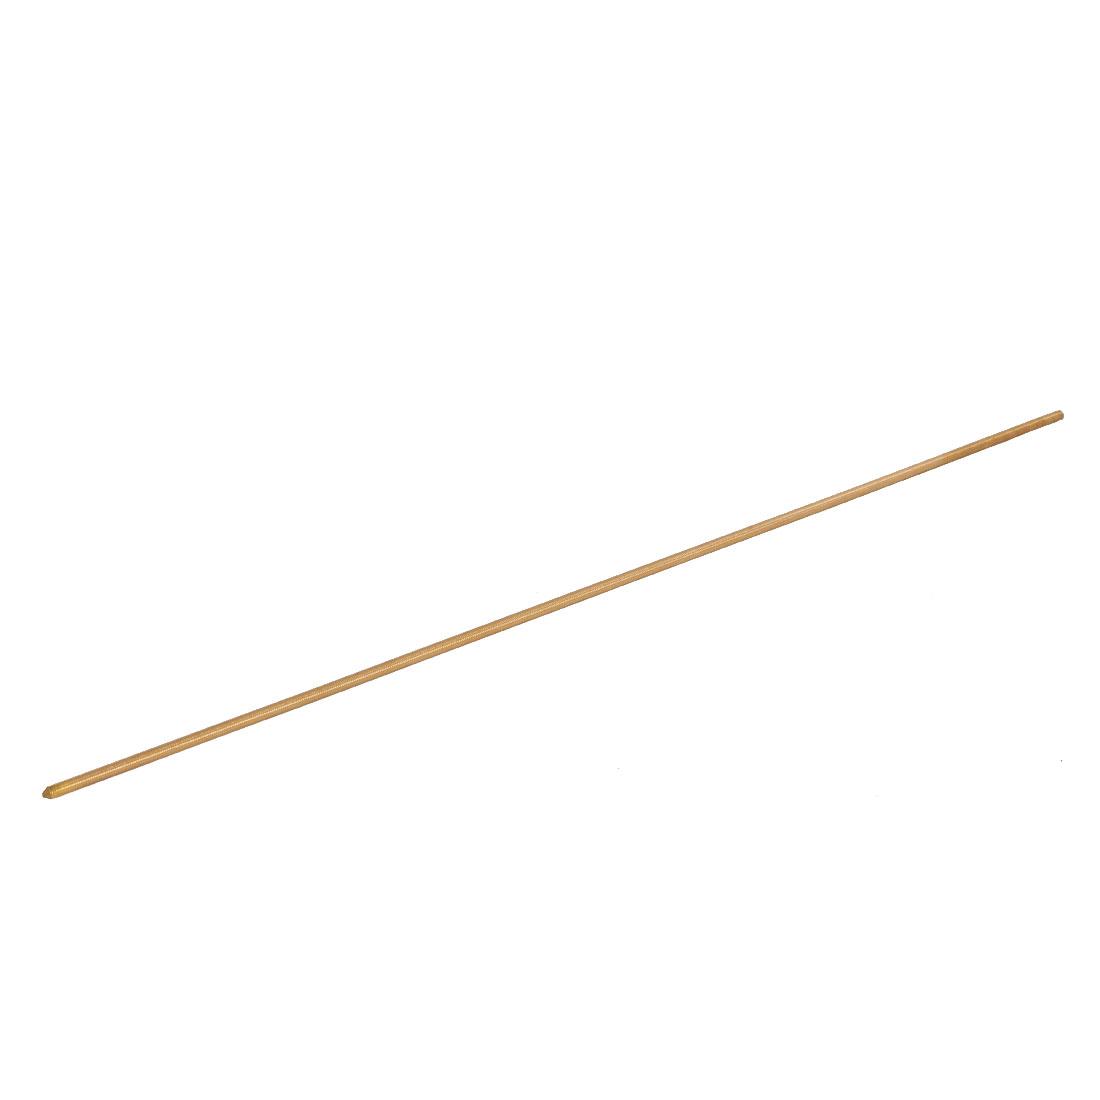 M5 x 500mm Male Threaded 0.8mm Pitch Full Thread Brass Rod Bar Fastener Gold Tone